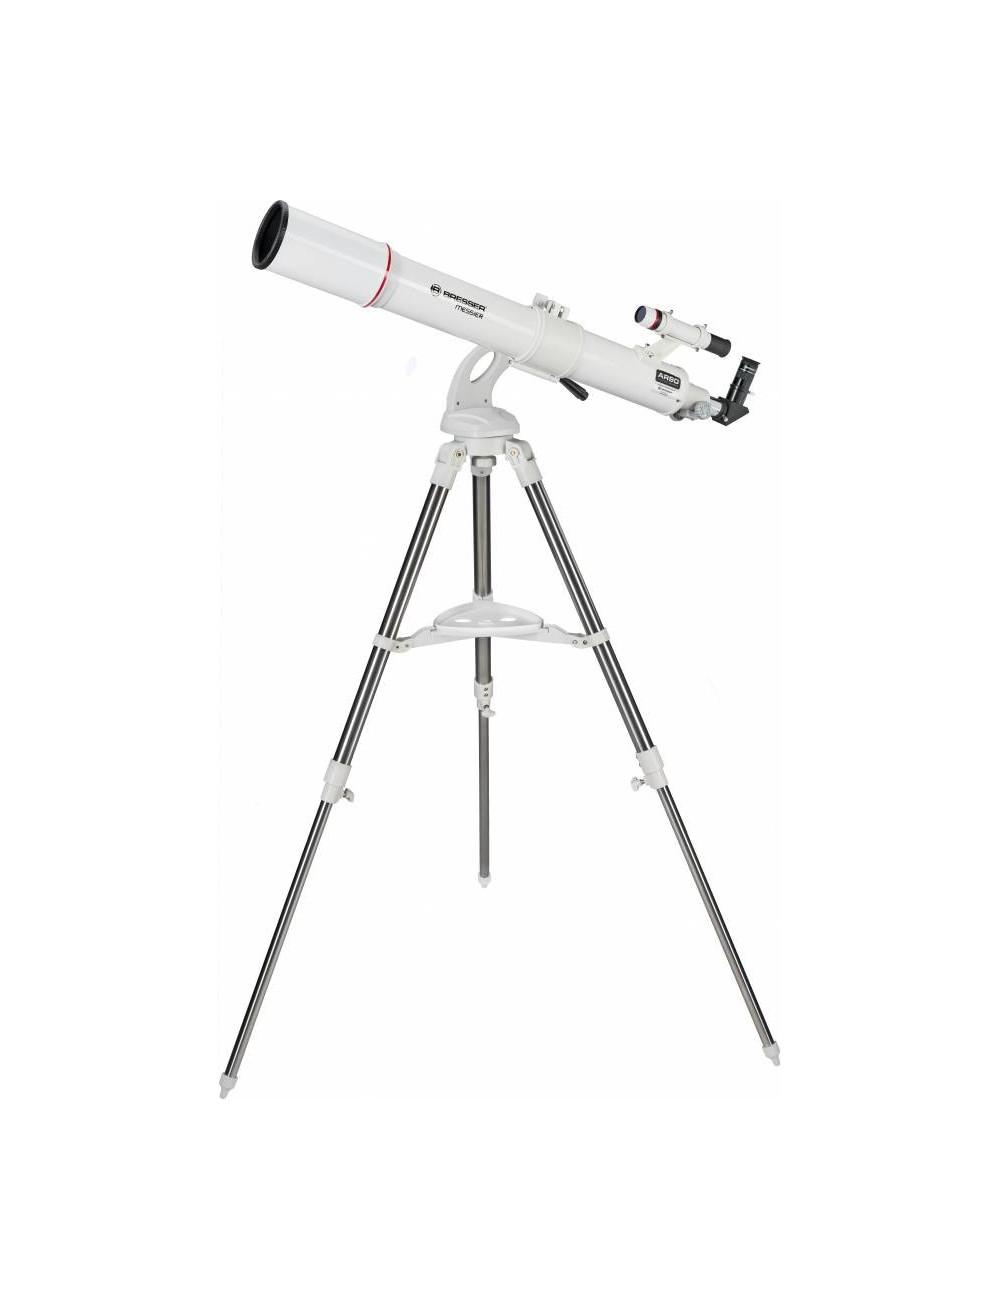 Lunette astronomique Bresser Messier AR-90/900 Nano